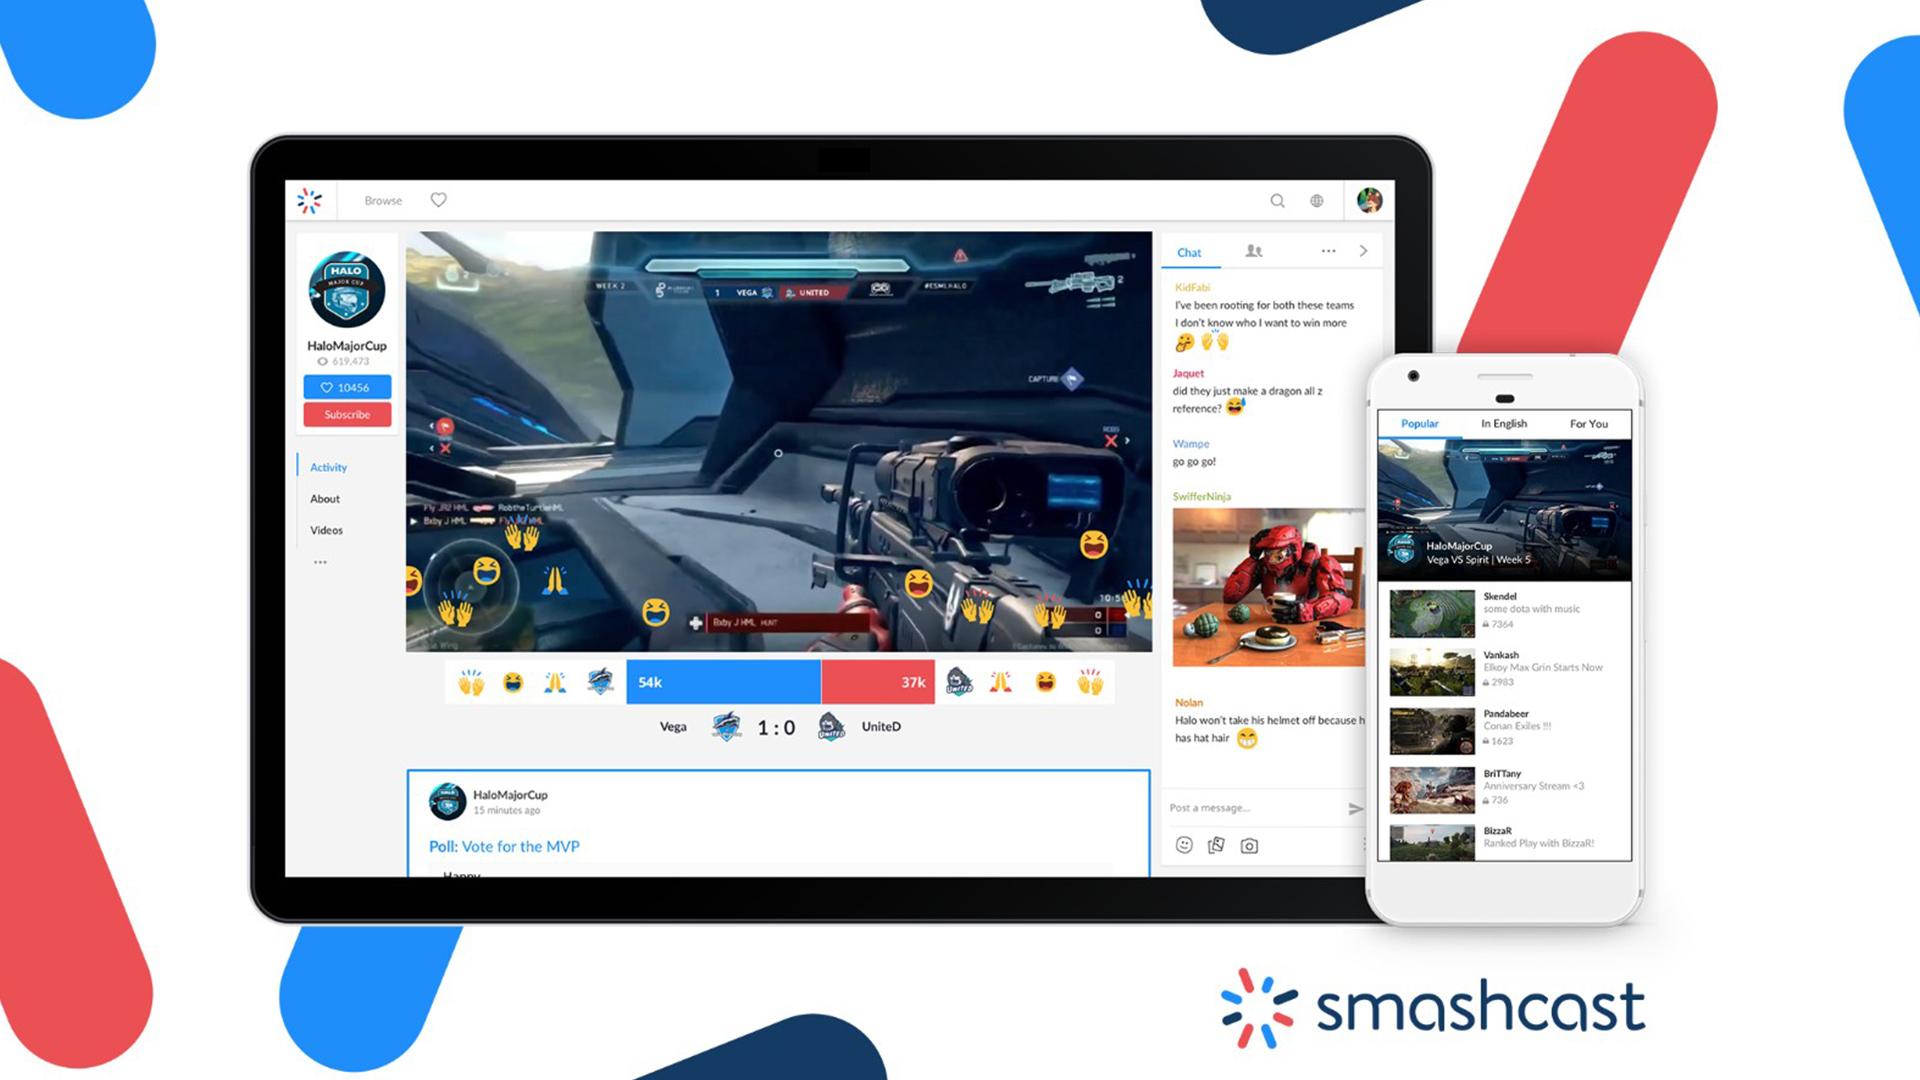 Smashcast.tv